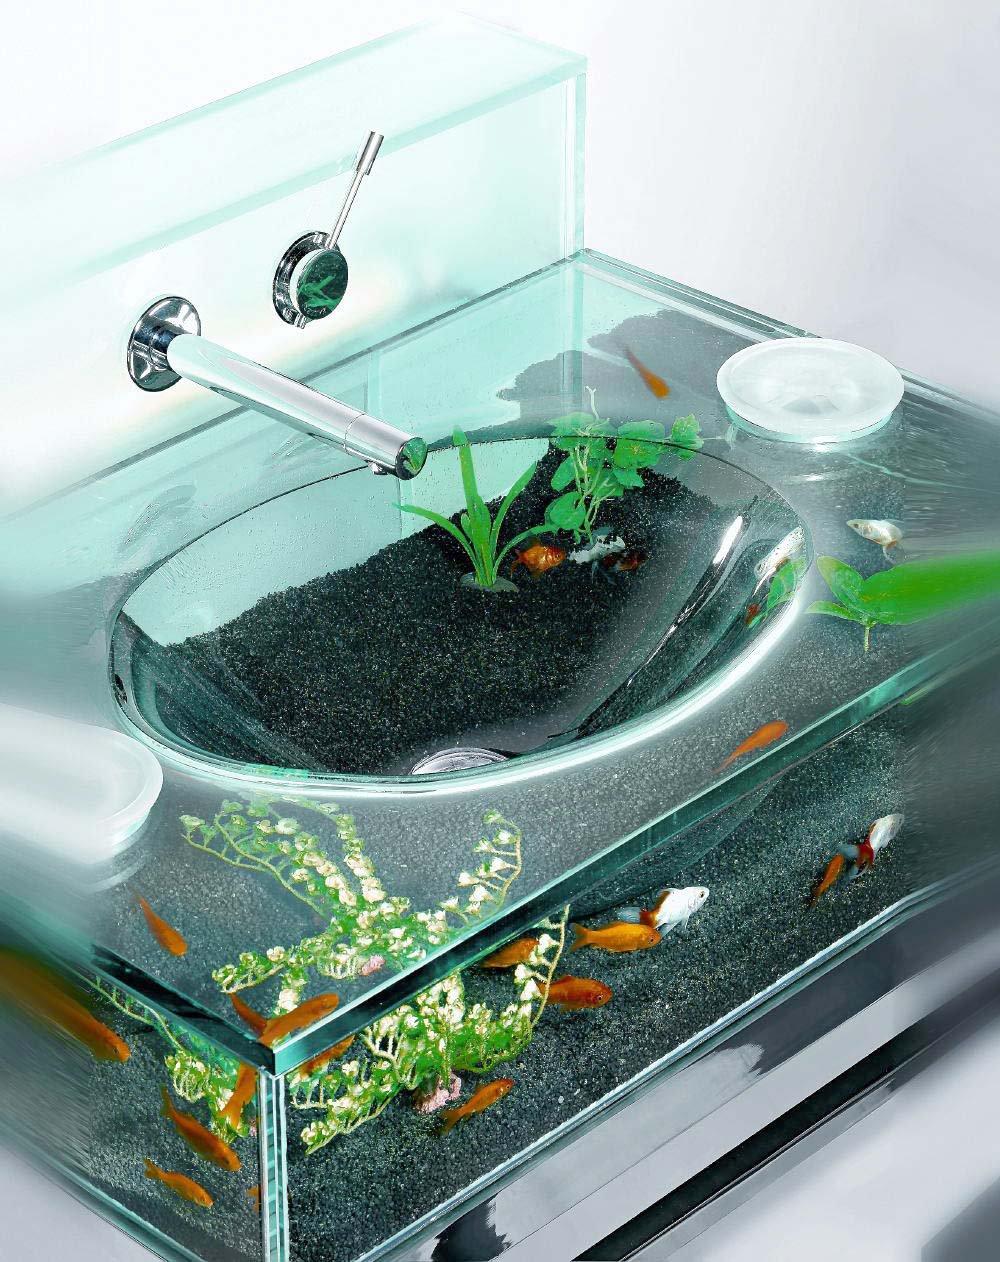 Epic sink